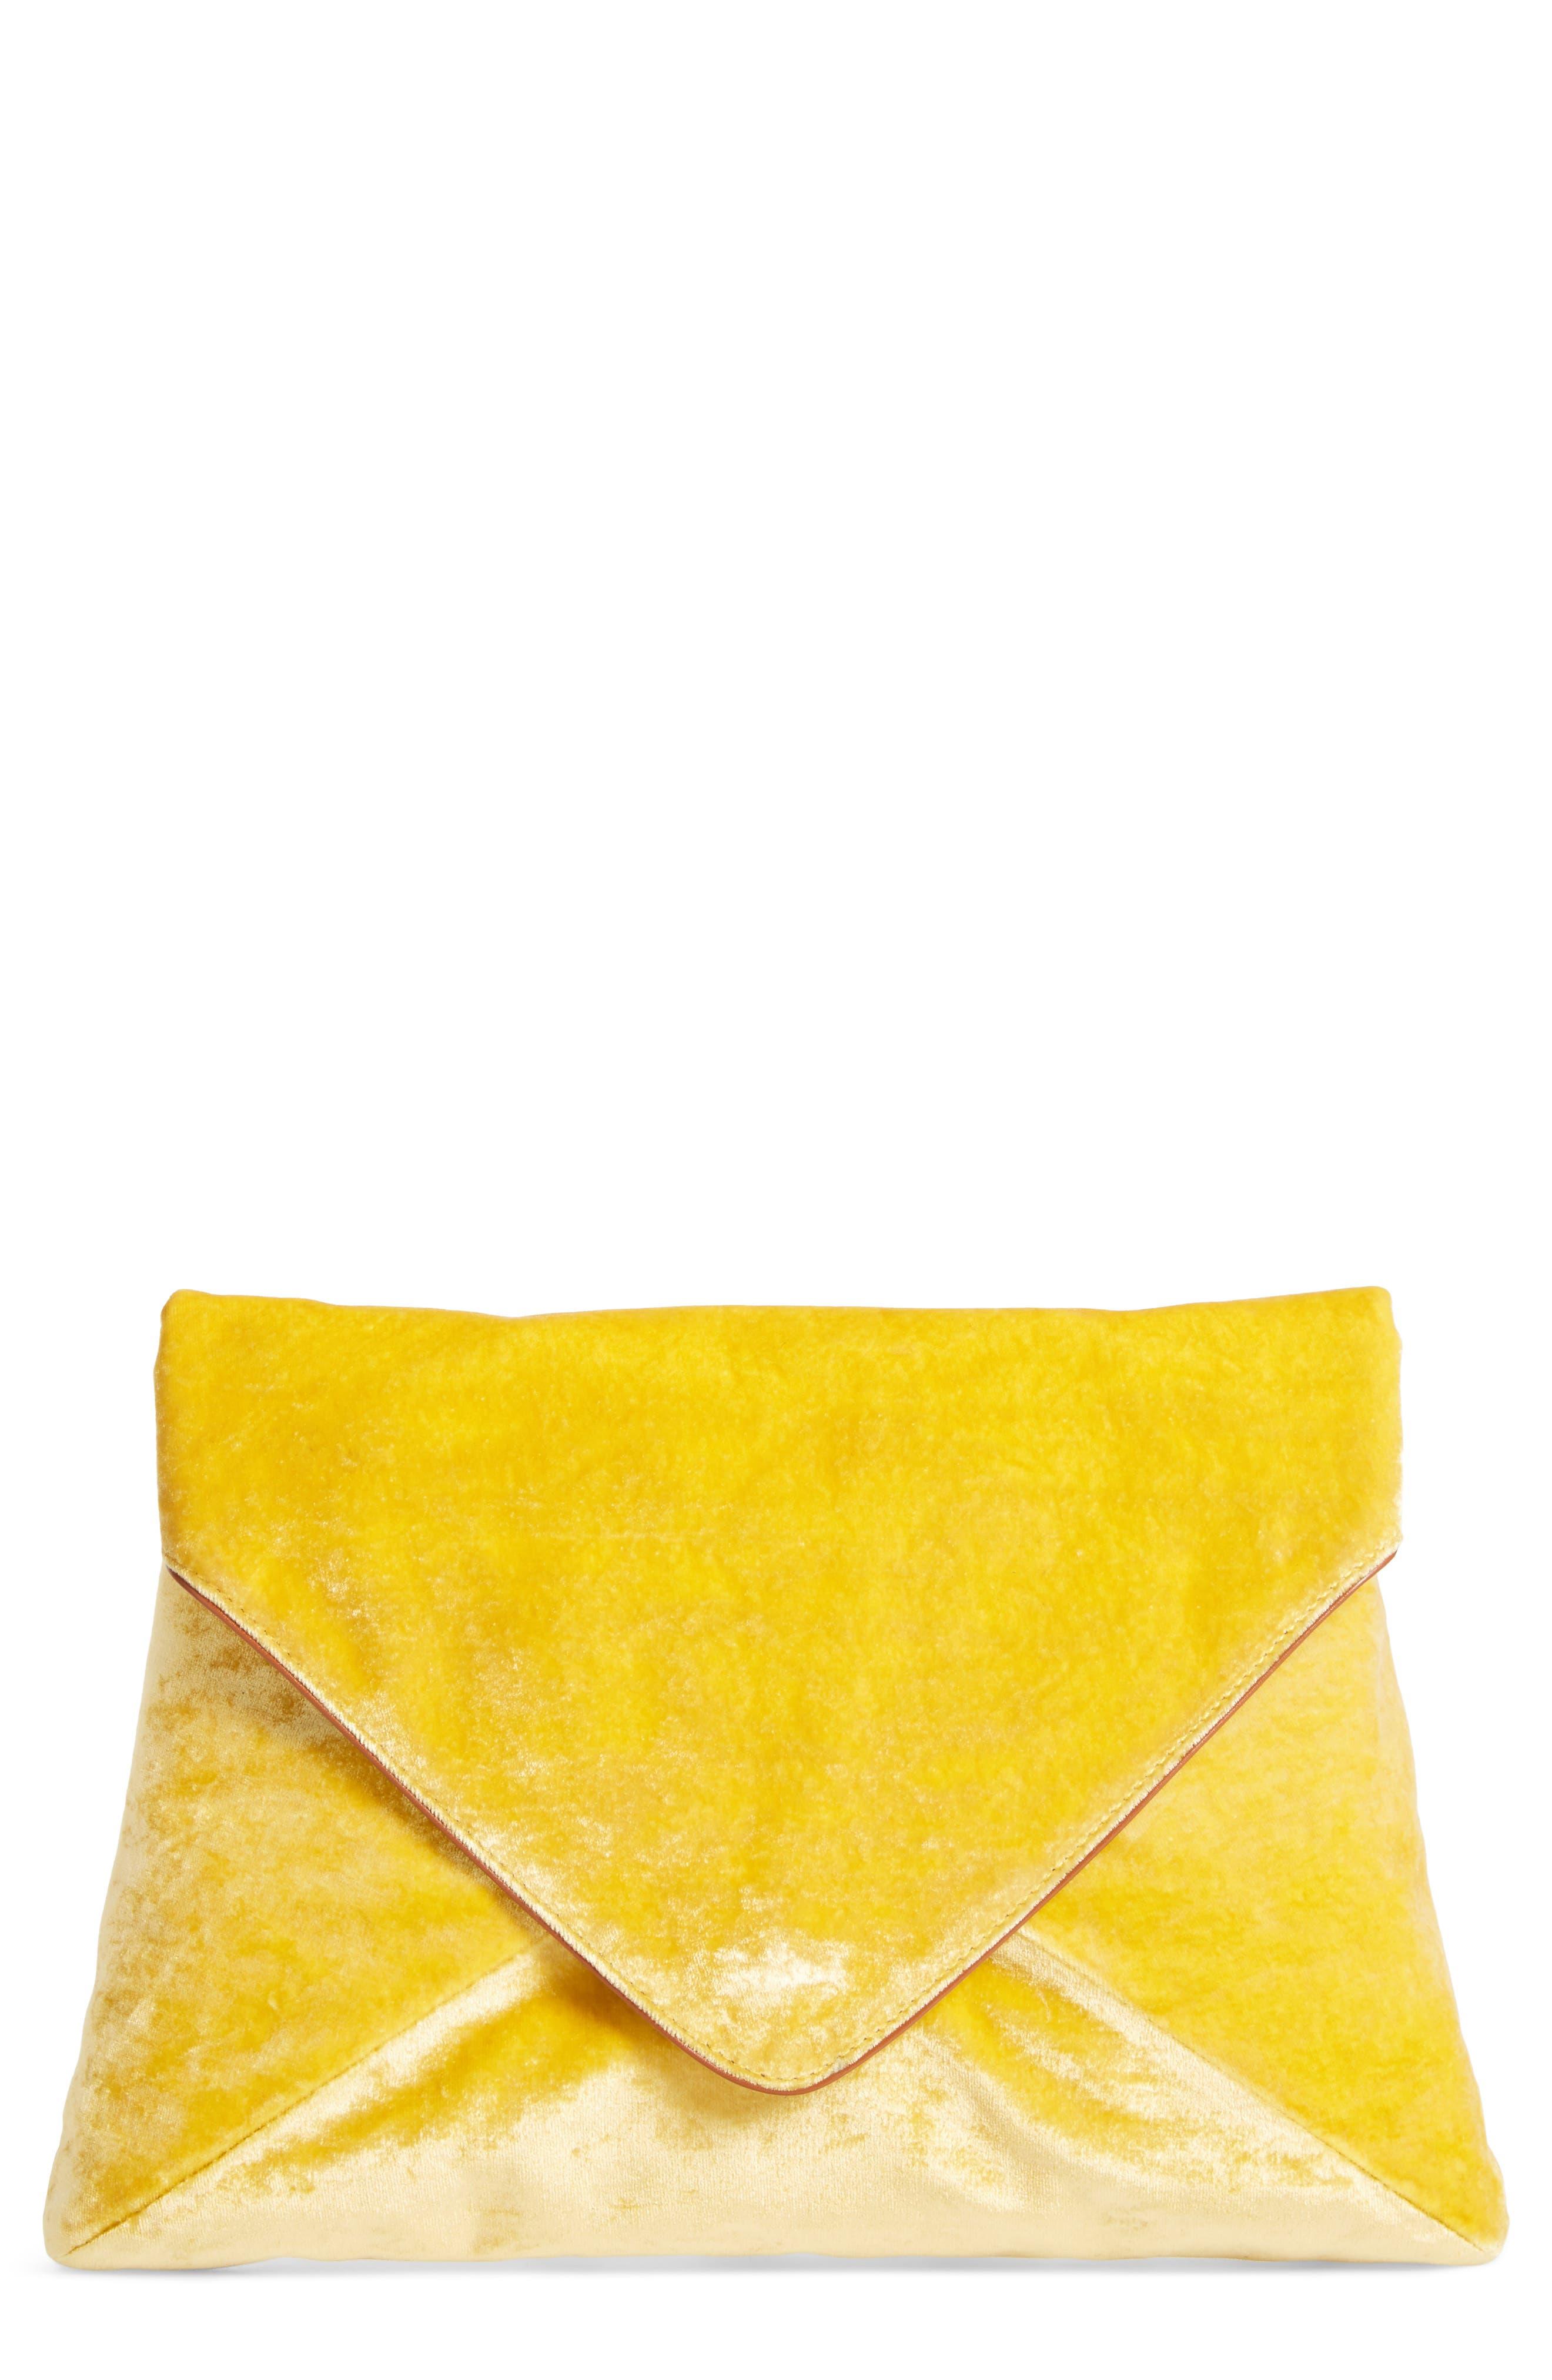 Velvet Envelope Clutch,                         Main,                         color, Yellow